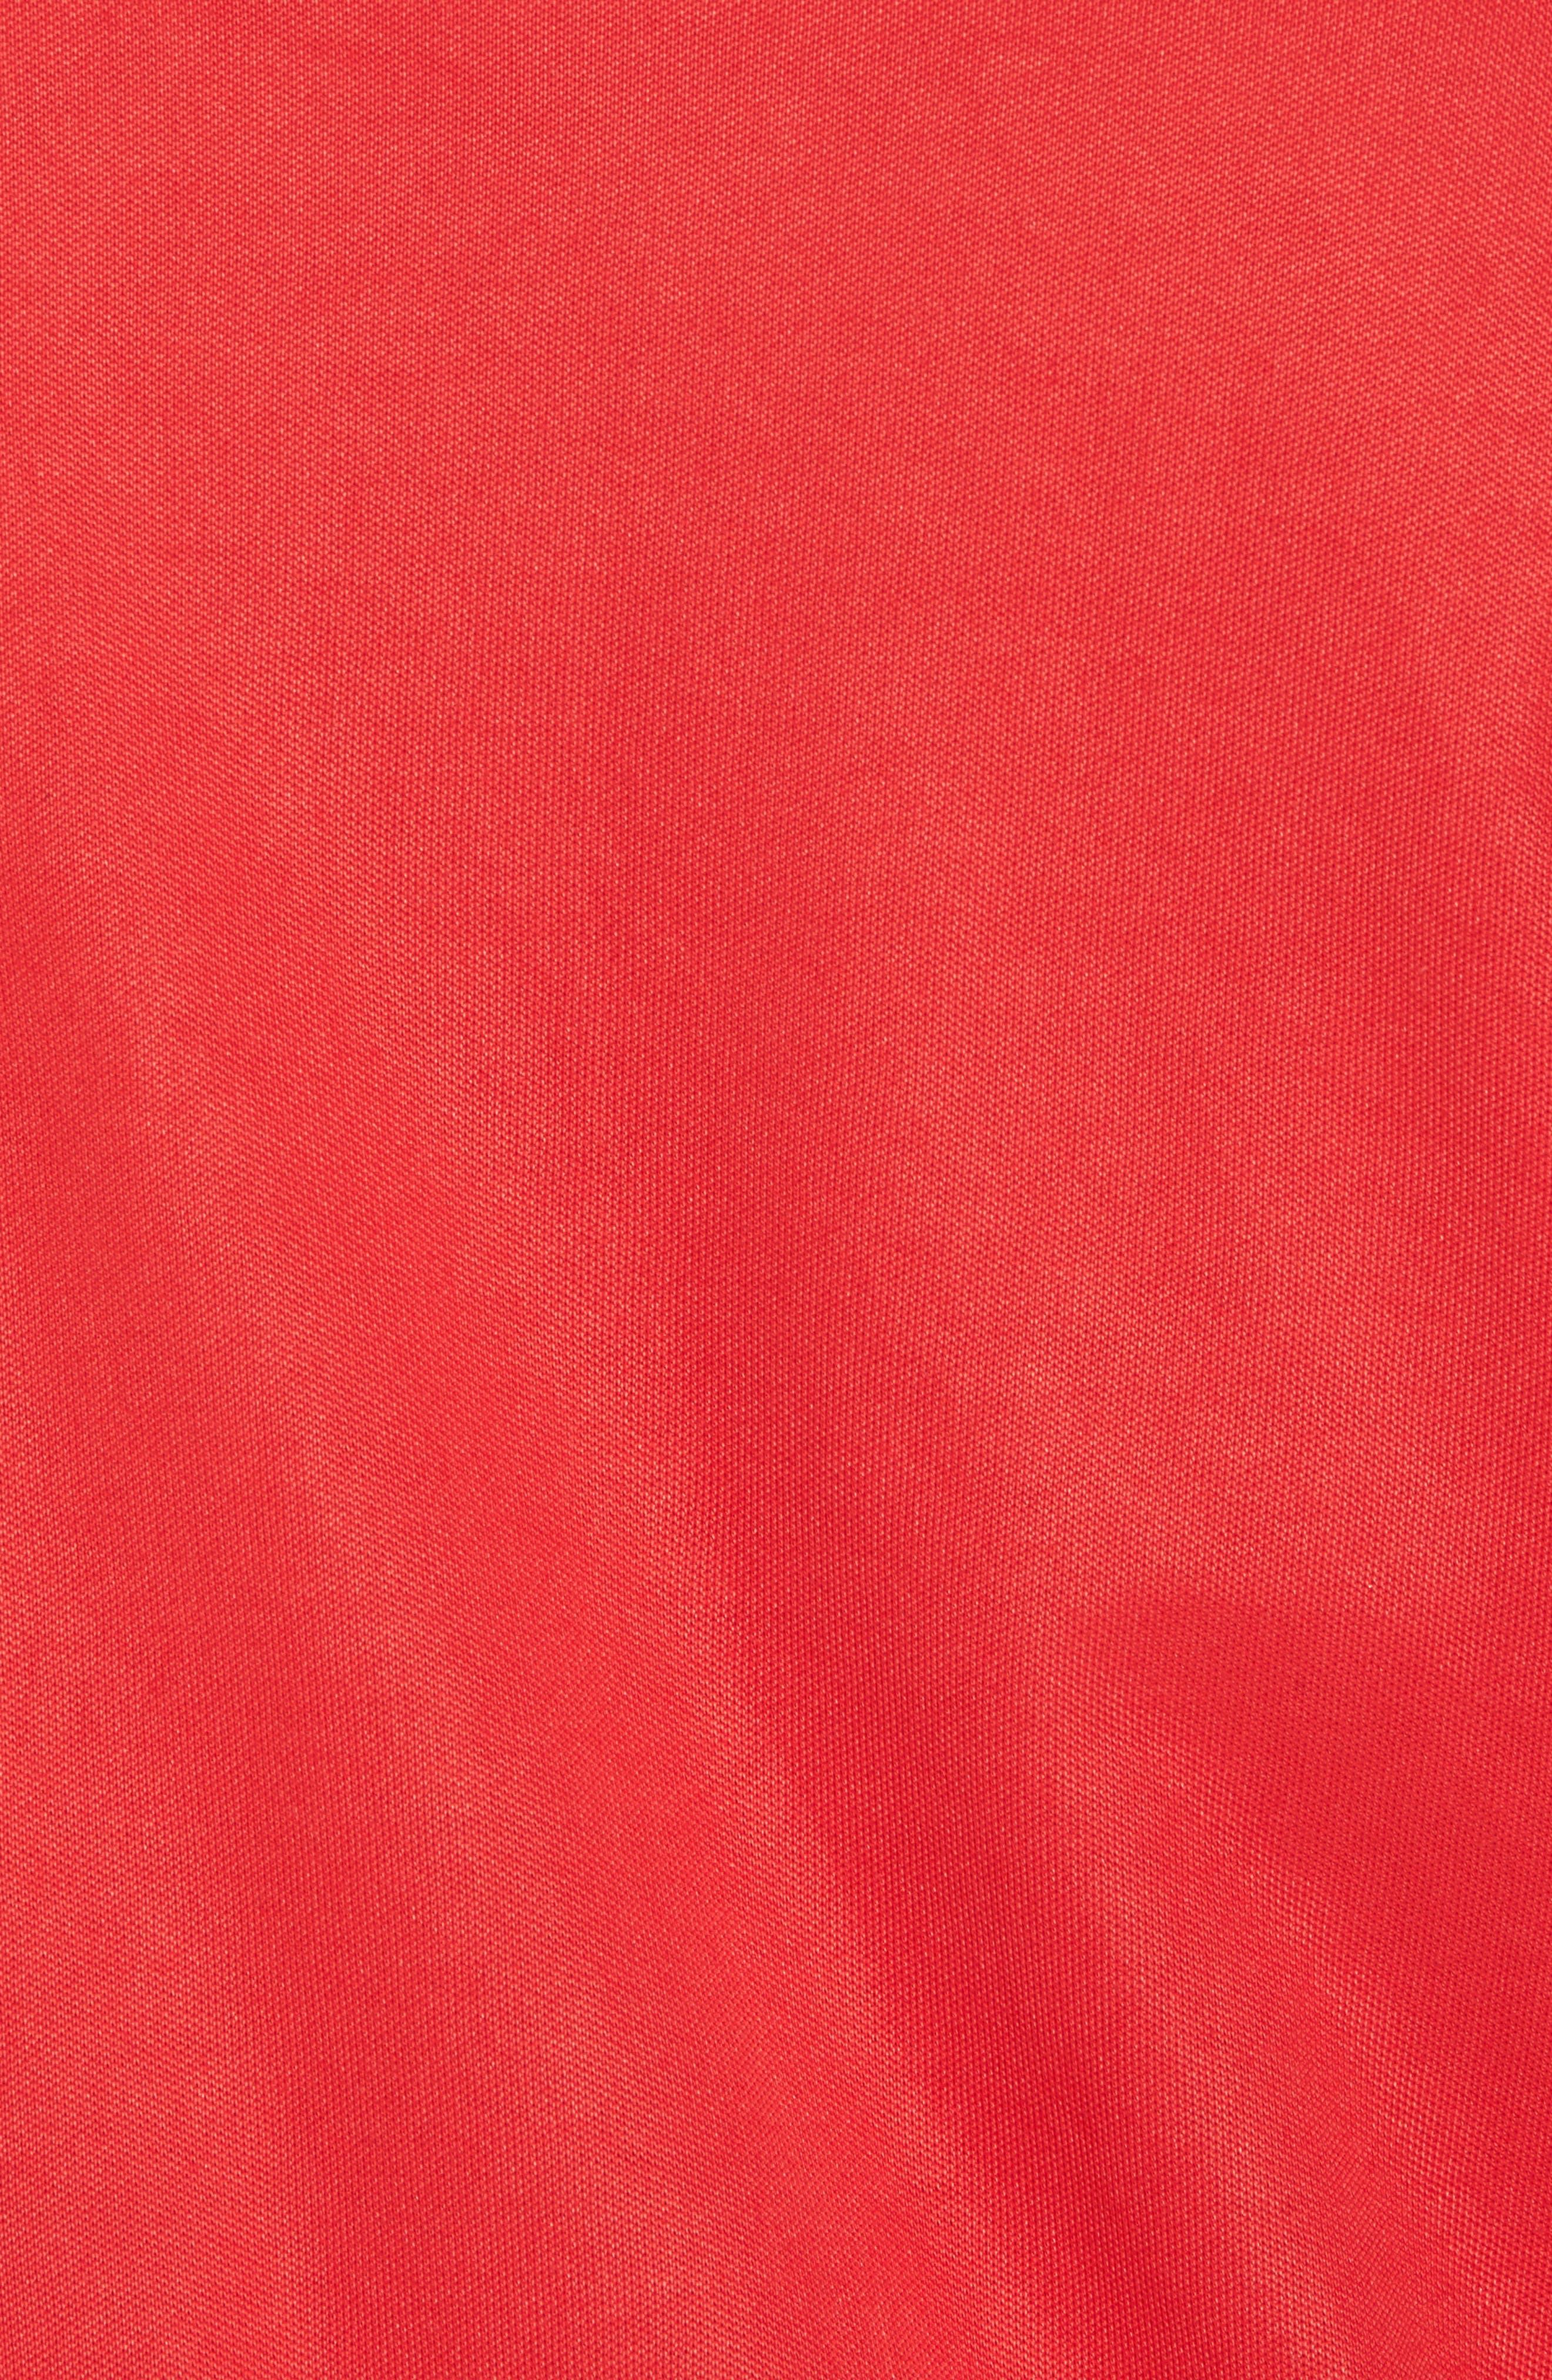 Grosso Jacket,                             Alternate thumbnail 5, color,                             450